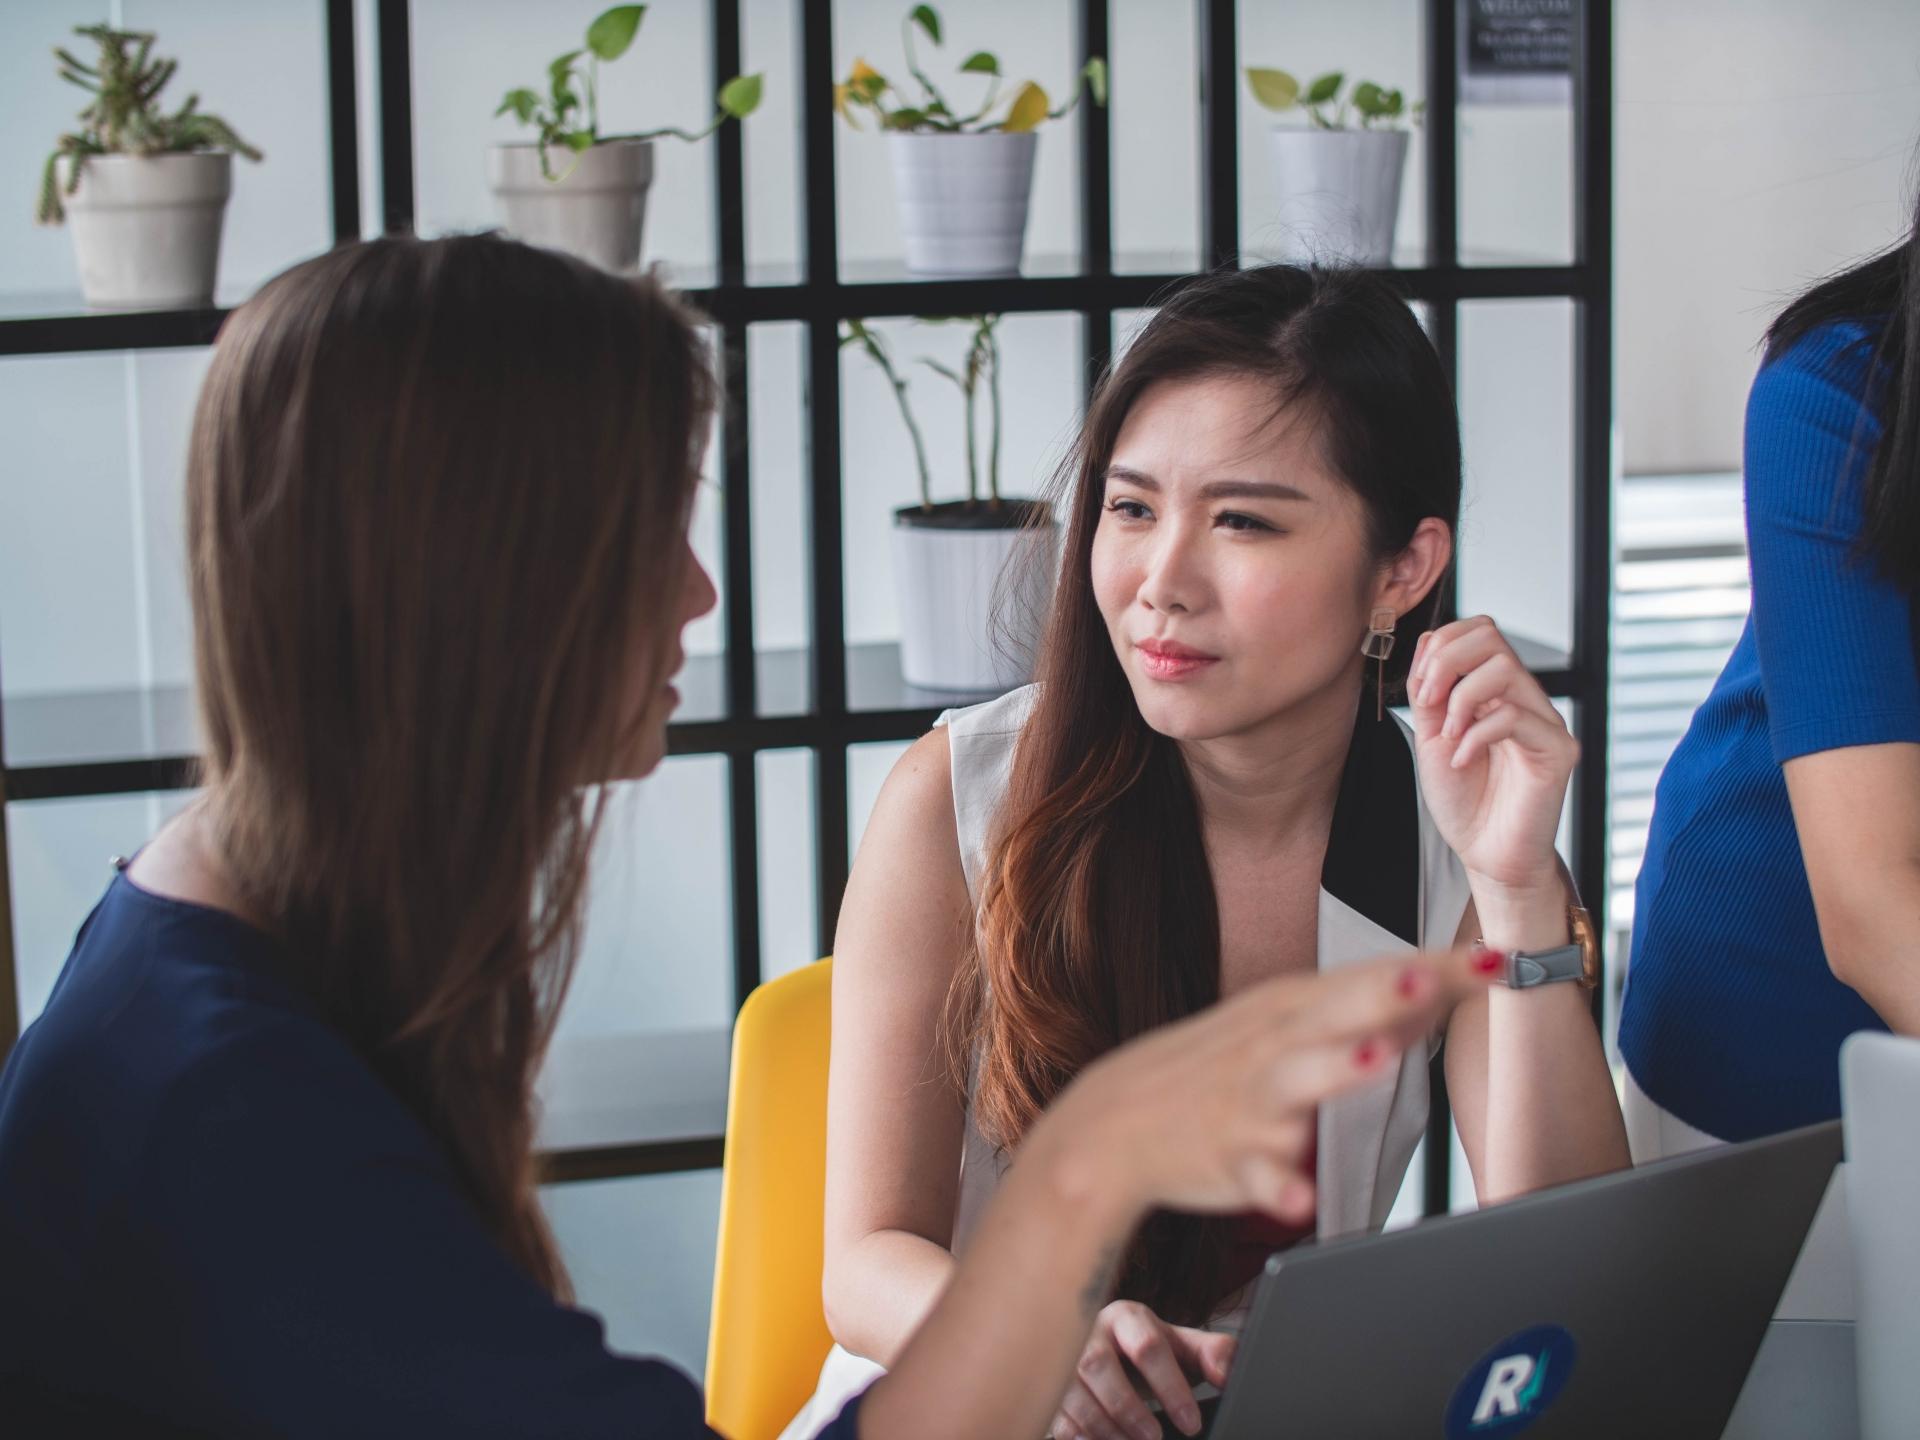 Women in senior leadership positions pass 30 per cent mark despite global pandemic